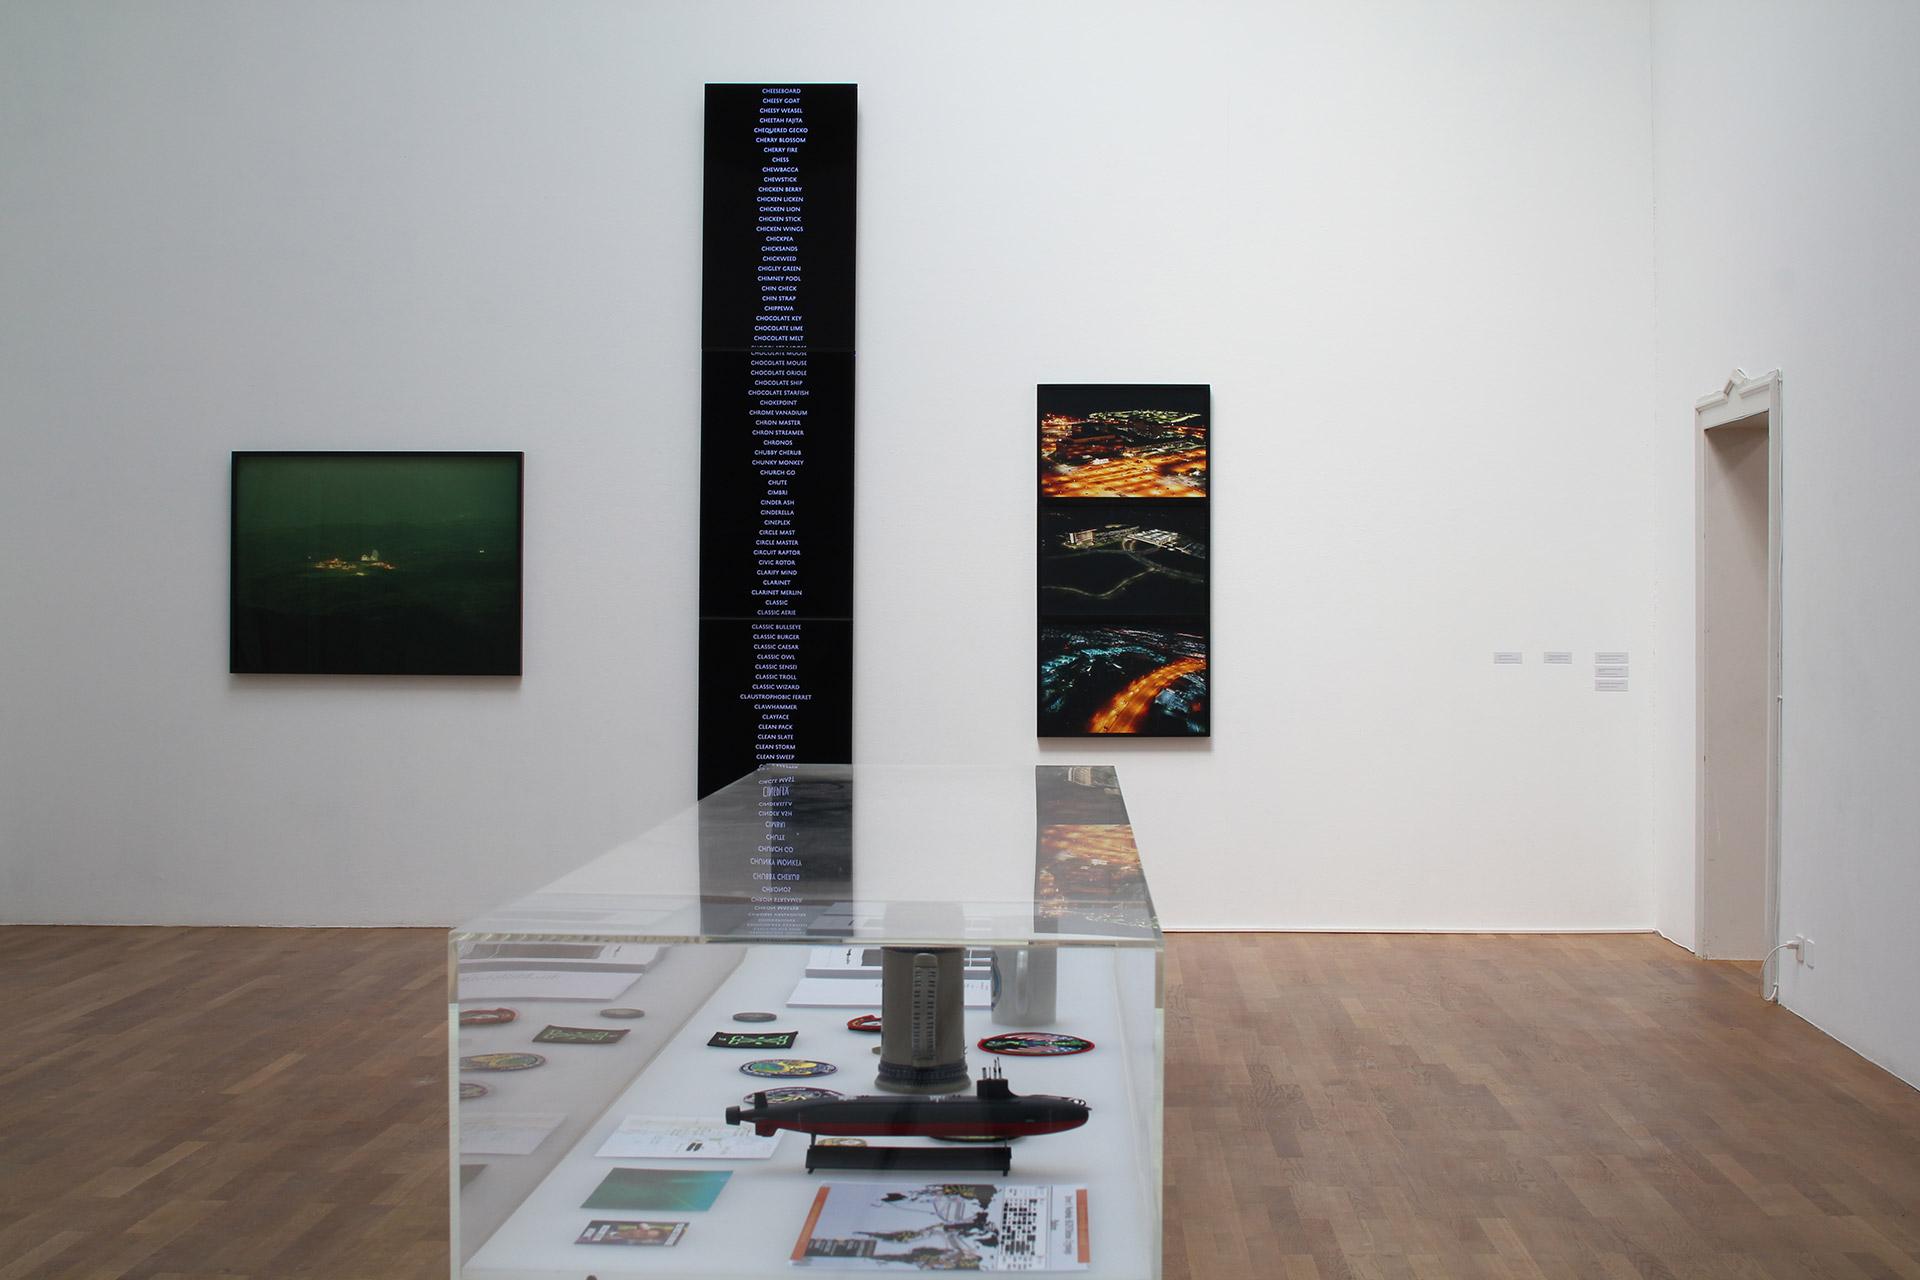 Trevor-Paglen-Kunsthalle-Winterthur-2018